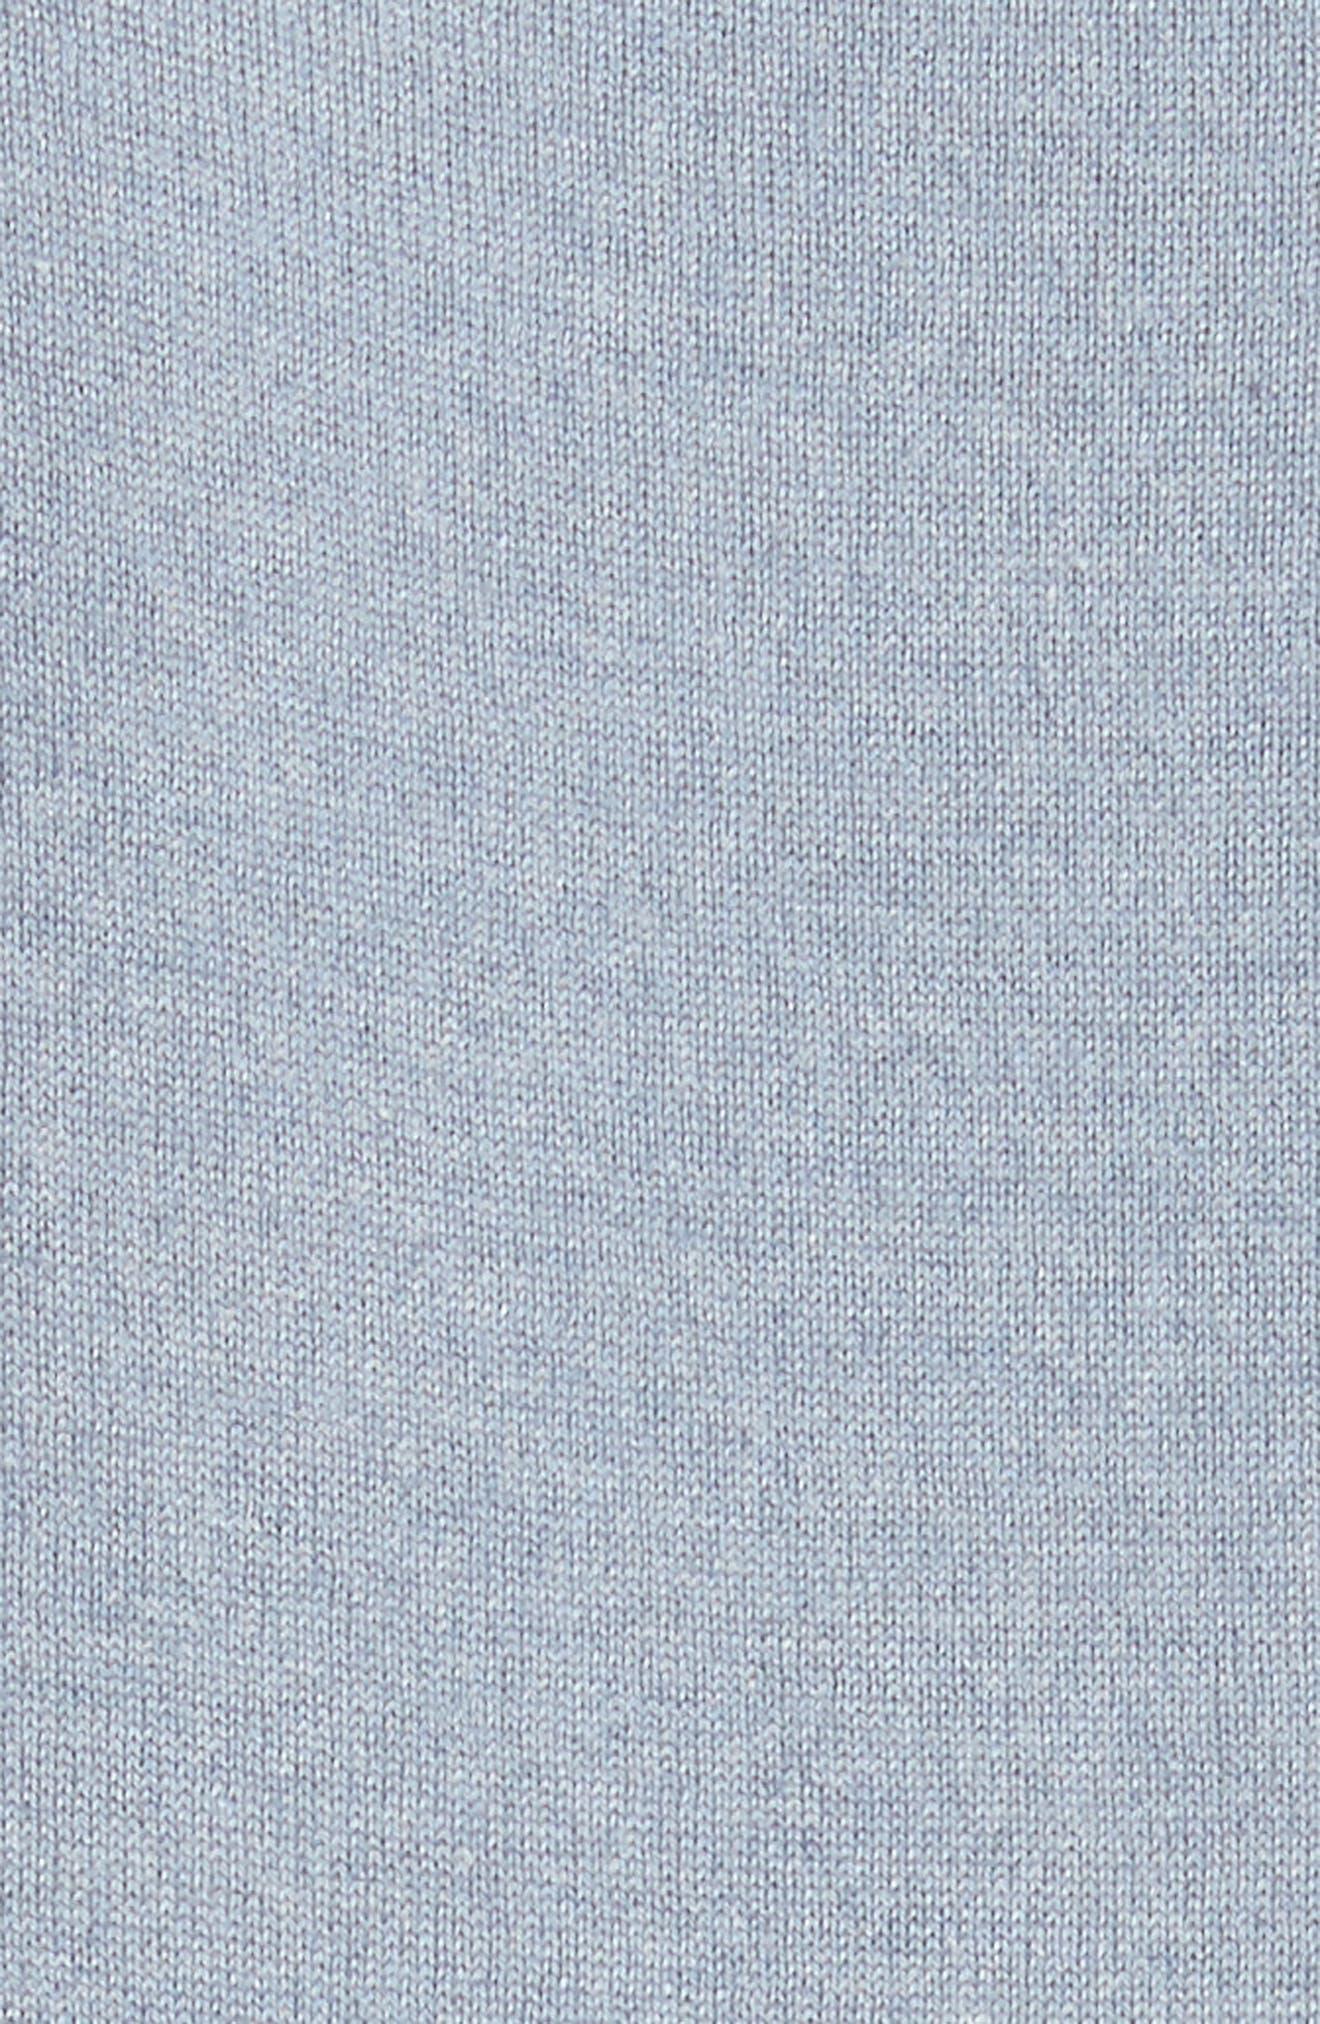 V-Neck Cashmere & Silk Knit Dress,                             Alternate thumbnail 5, color,                             411